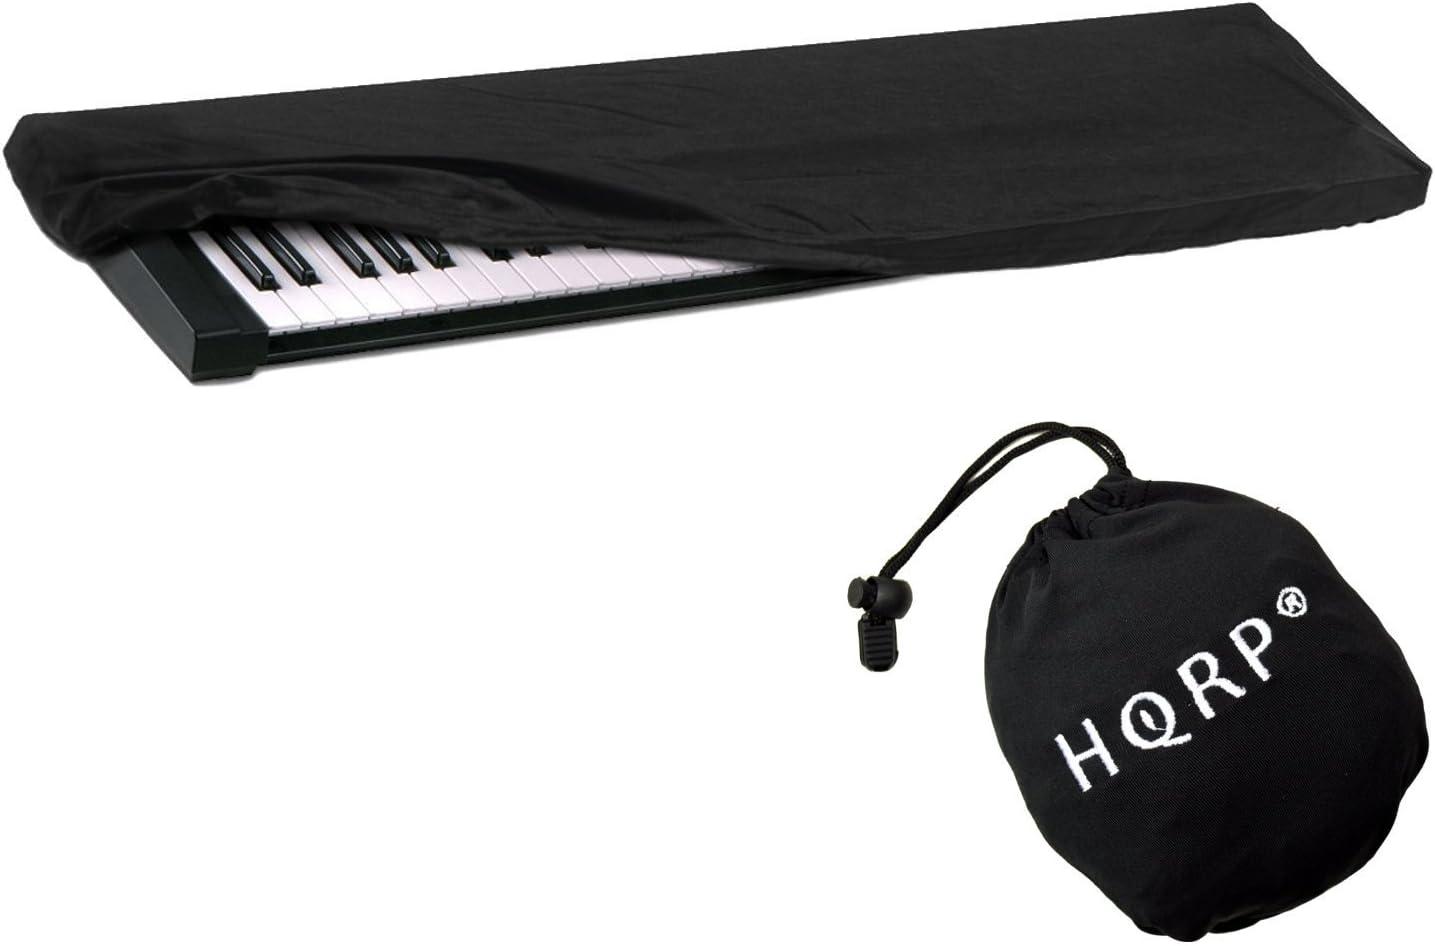 Keyboard KORG PA 4 x 61 ORIENTAL Abdeckung Dust Cover 10201 Viktory